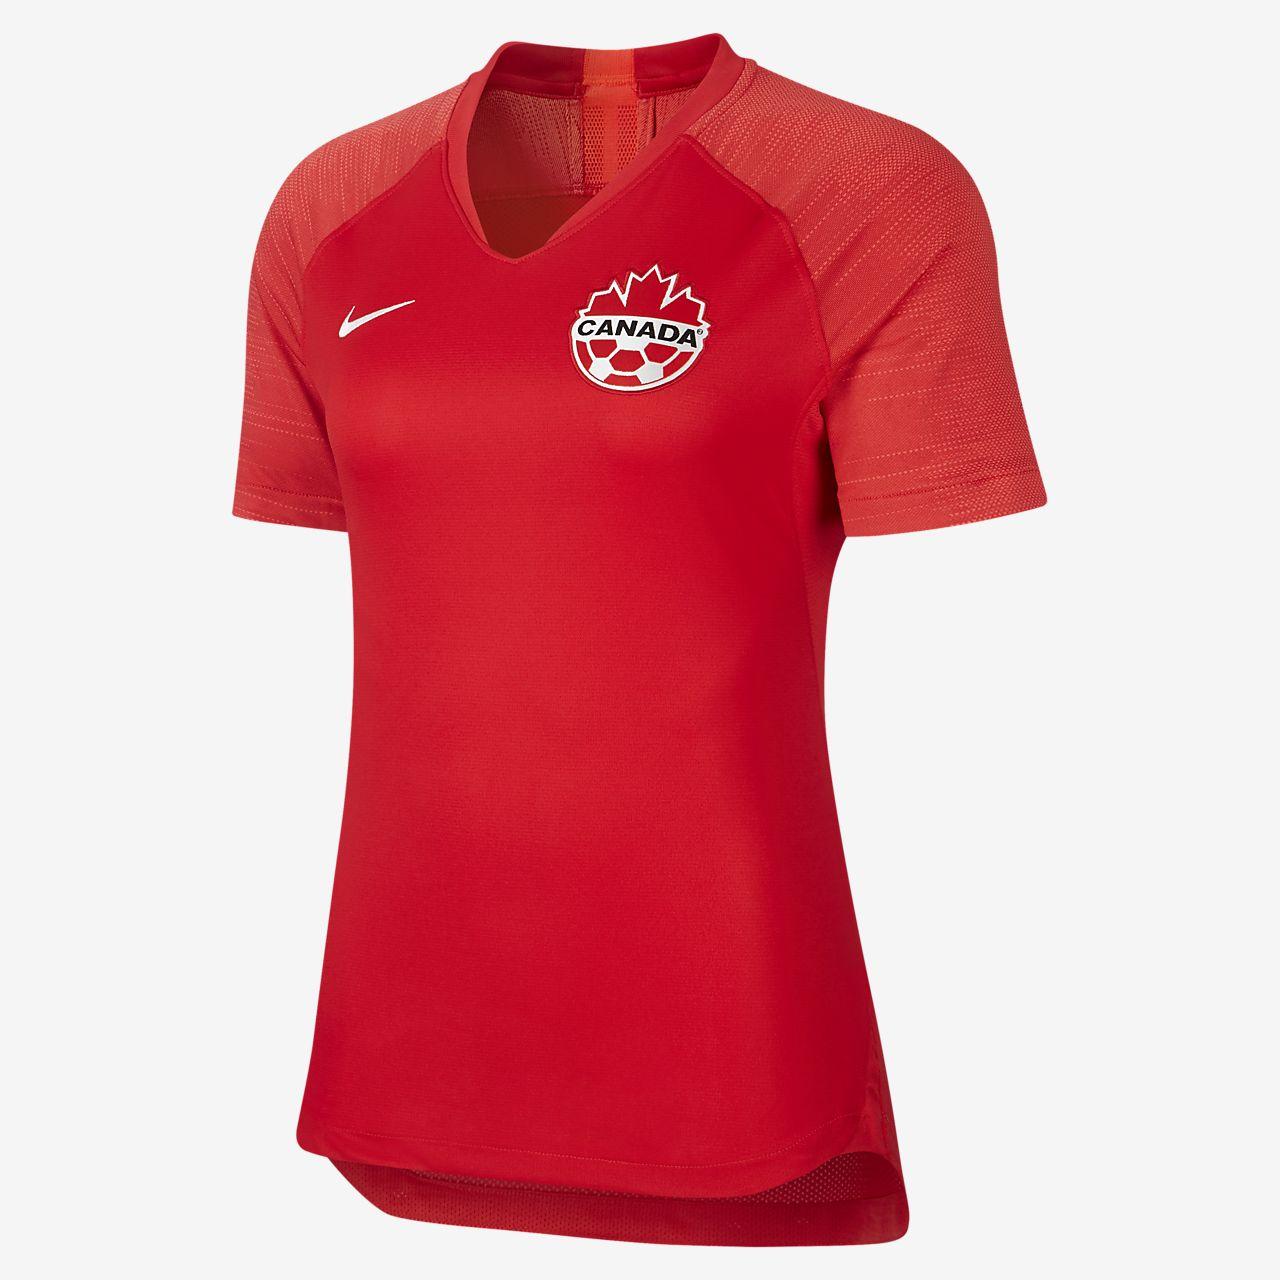 Kanada 2019 Stadium Home Damen-Fußballtrikot